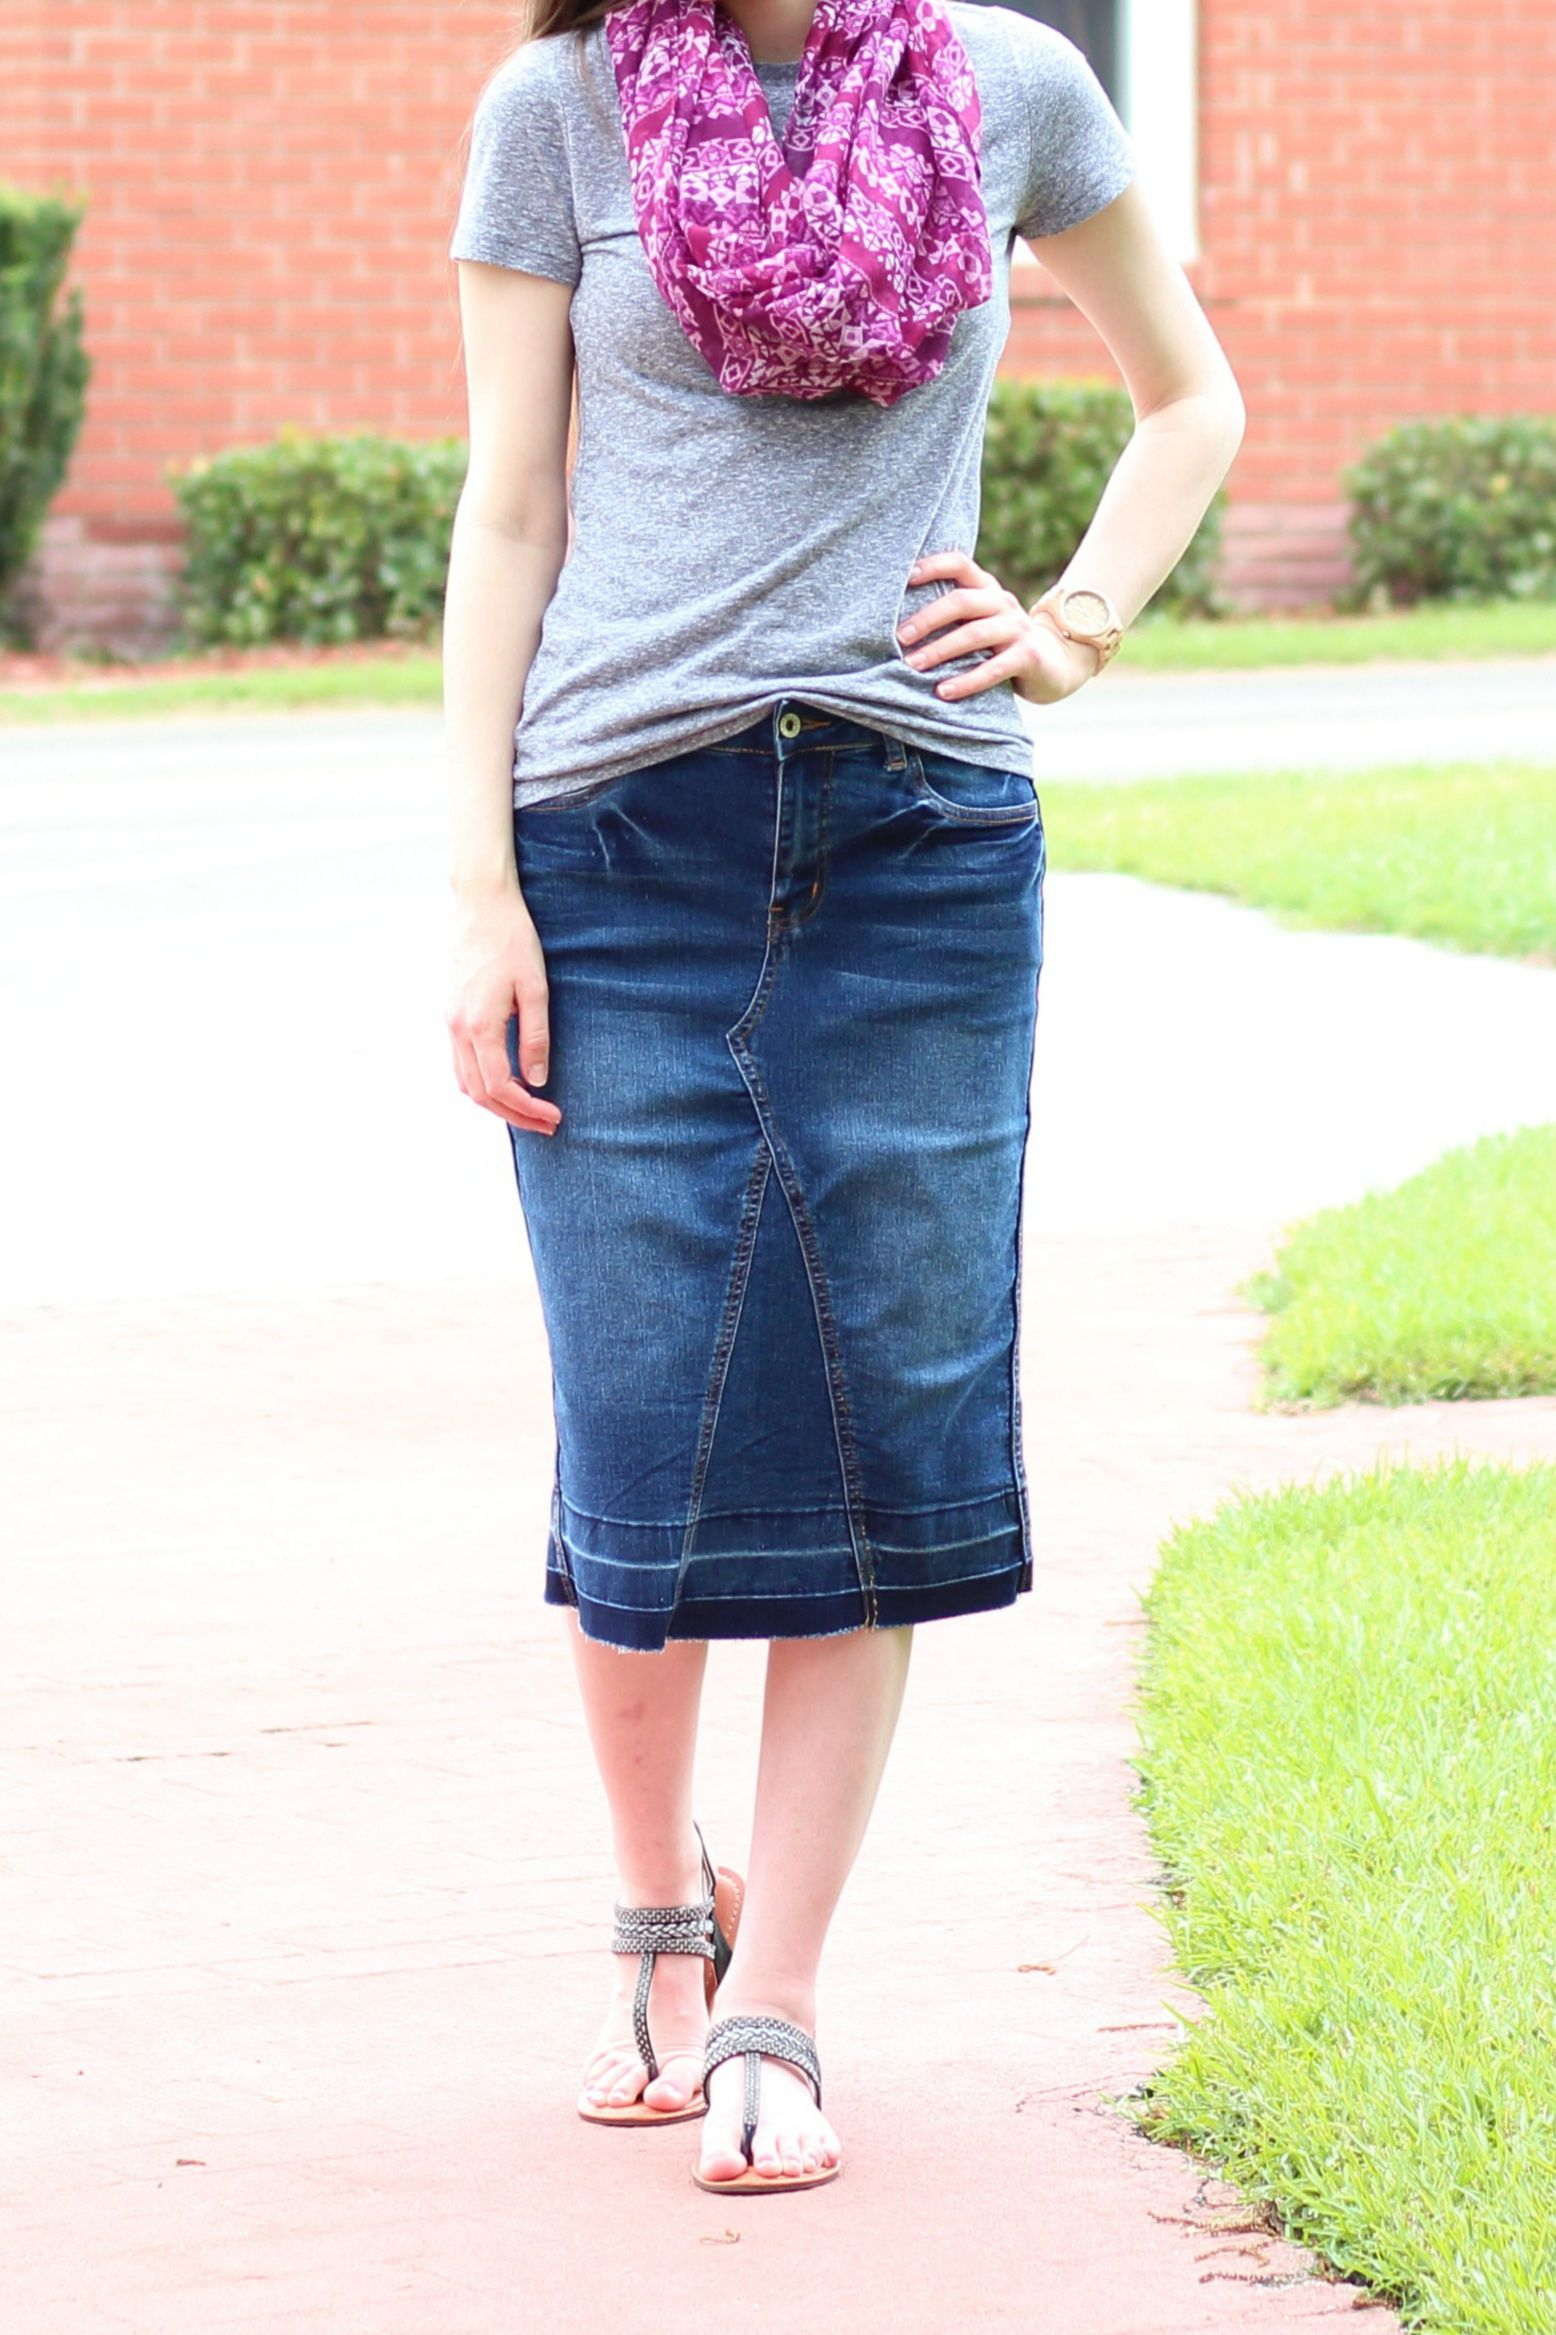 b234e490b525 Modest Casual Outfit Idea  Denim Skirt  Black Sandals  Gray Basic  Tee  Purple Aztec Print Scarf  Spring Summer Style ...